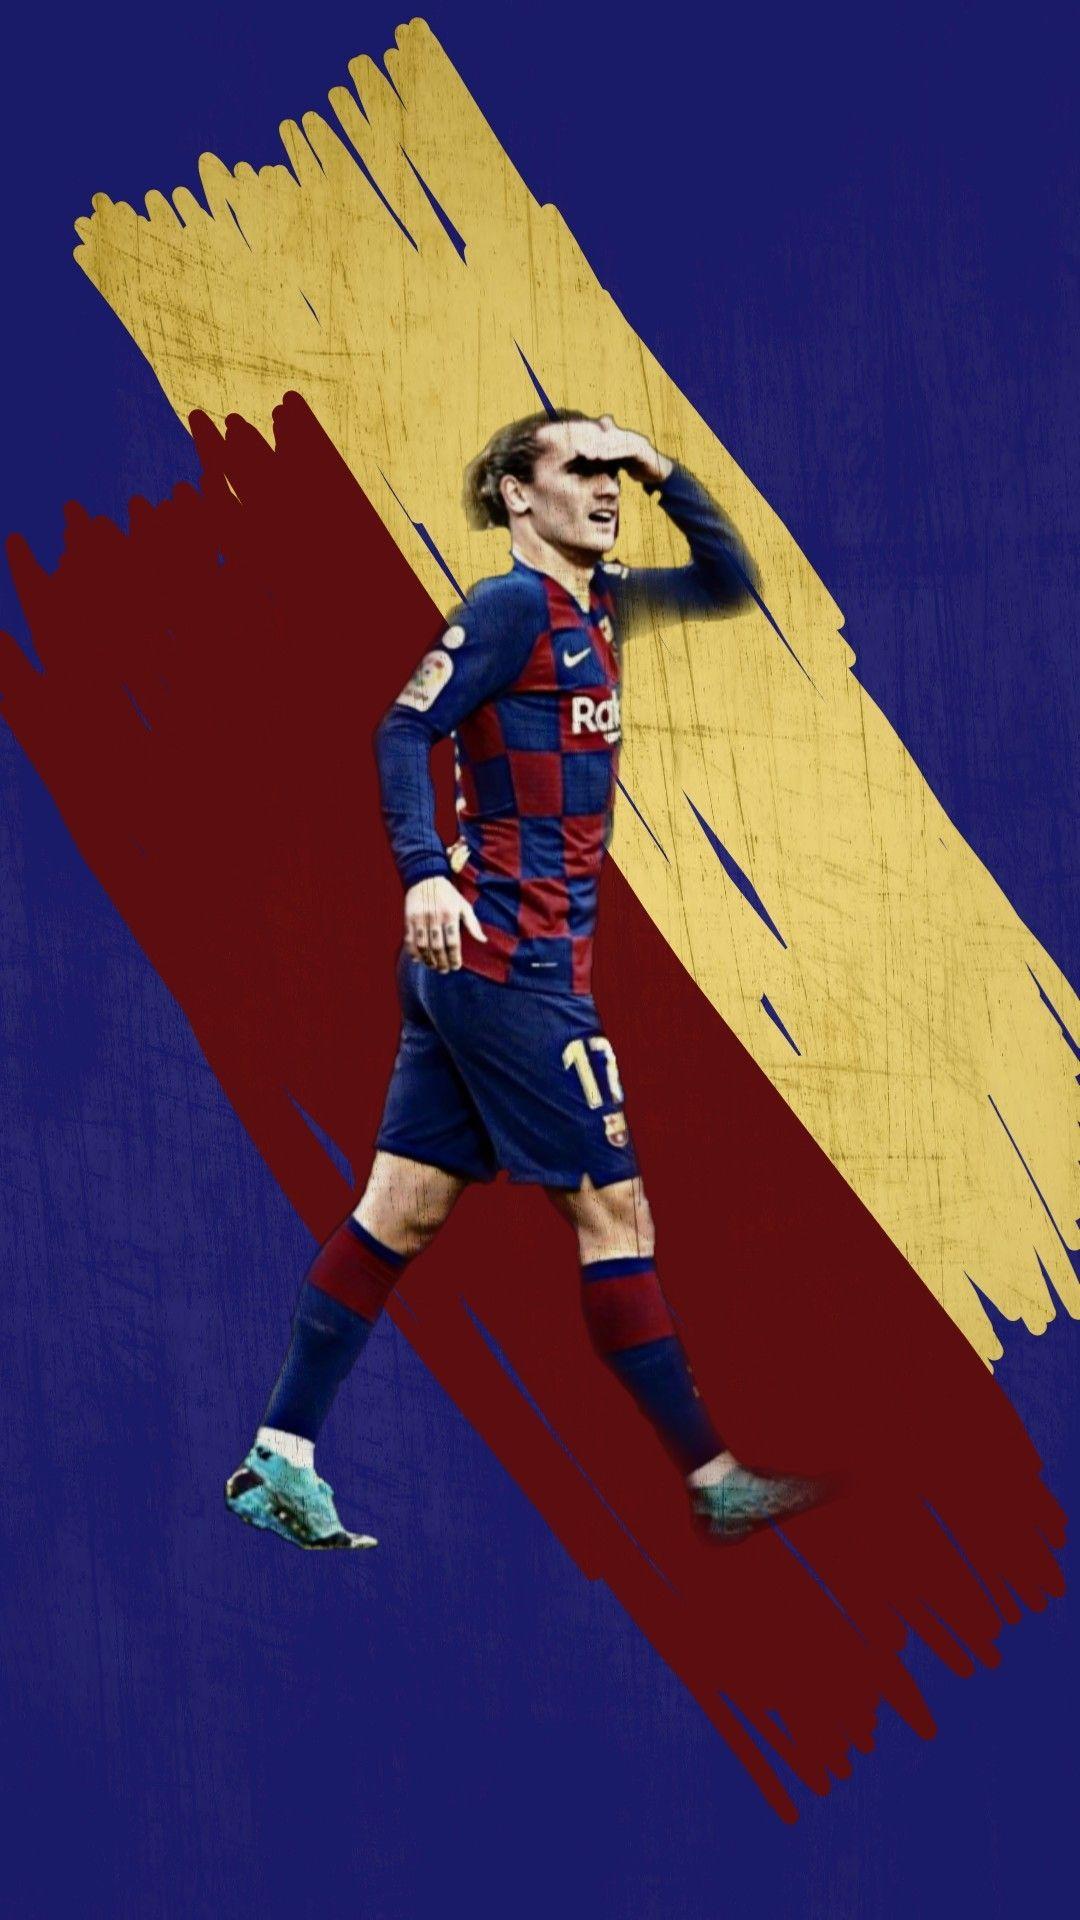 Antoine Griezmann Wallpaper En 2020 Futbol De Barcelona Griezmann Antonie Griezmann